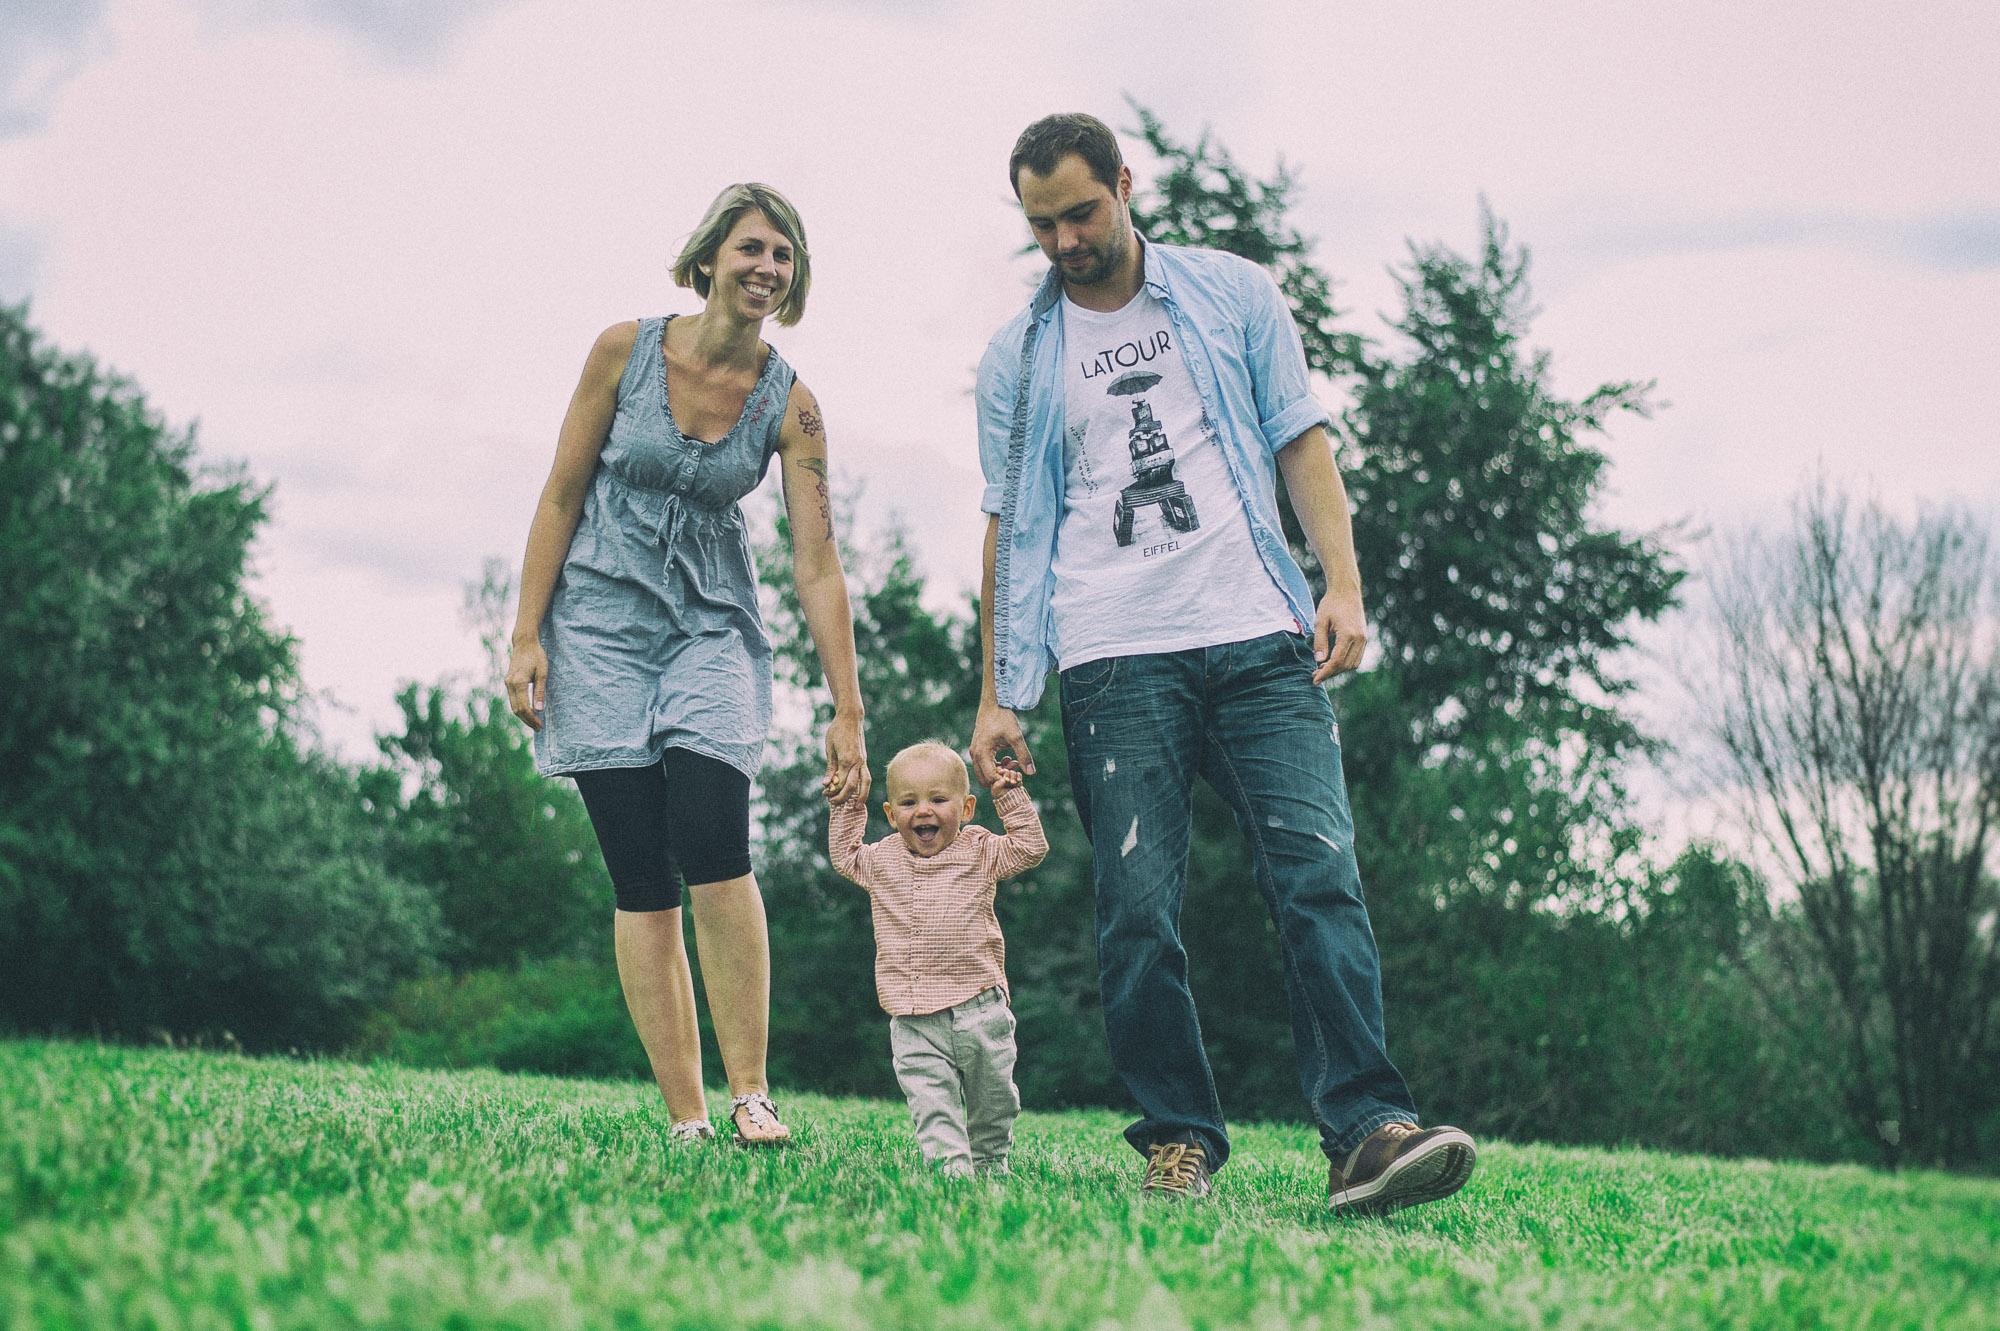 Familienfotograf Berlin Boris Mehl Spaziergang